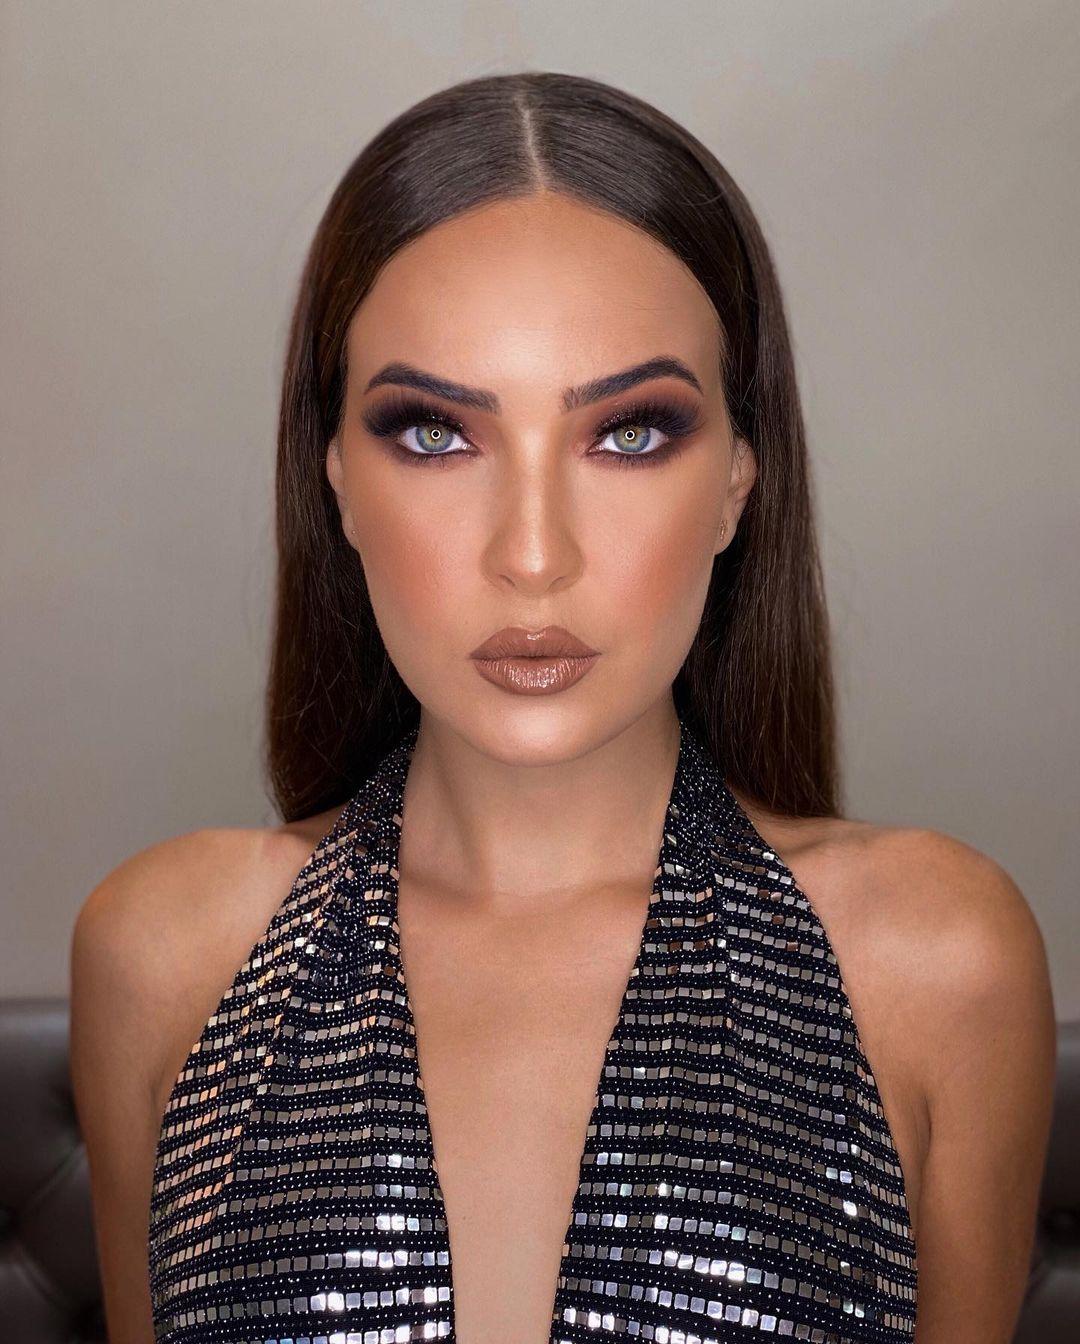 anne karoline lisboa, miss simpatia de miss brasil mundo 2019. 13264914